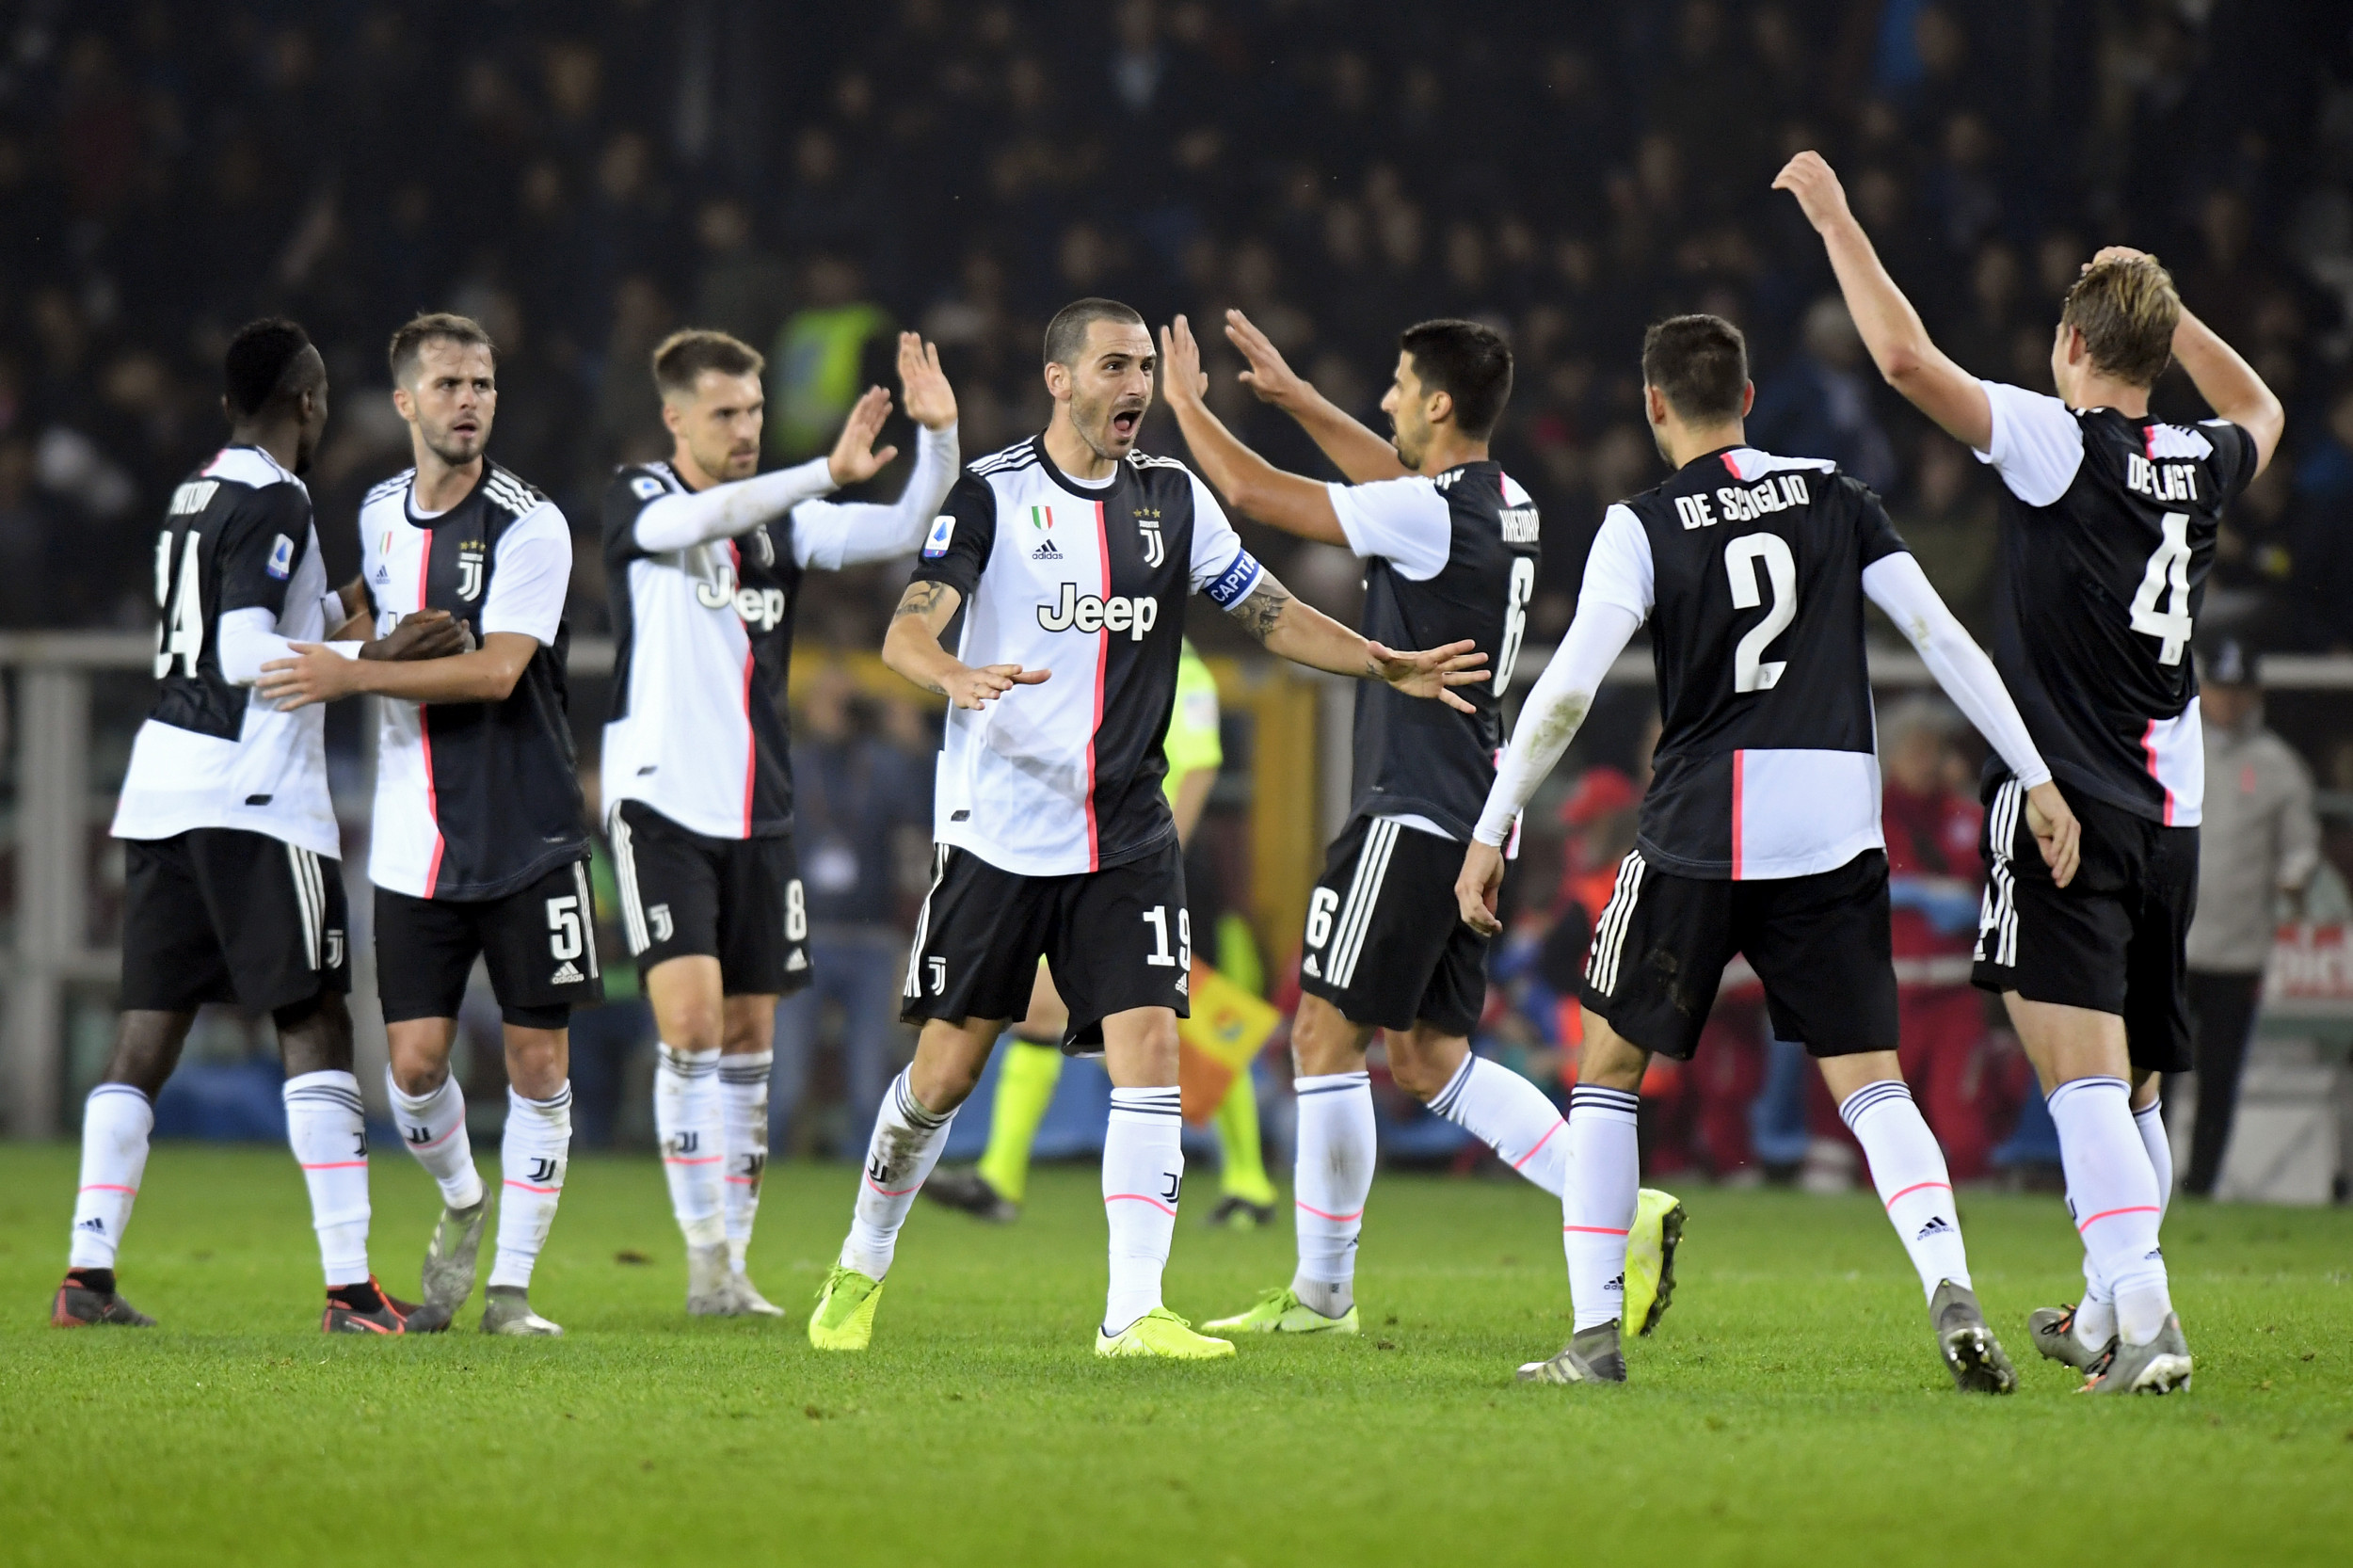 Lokomotiv Moscow Vs Juventus Where To Watch Uefa Champions